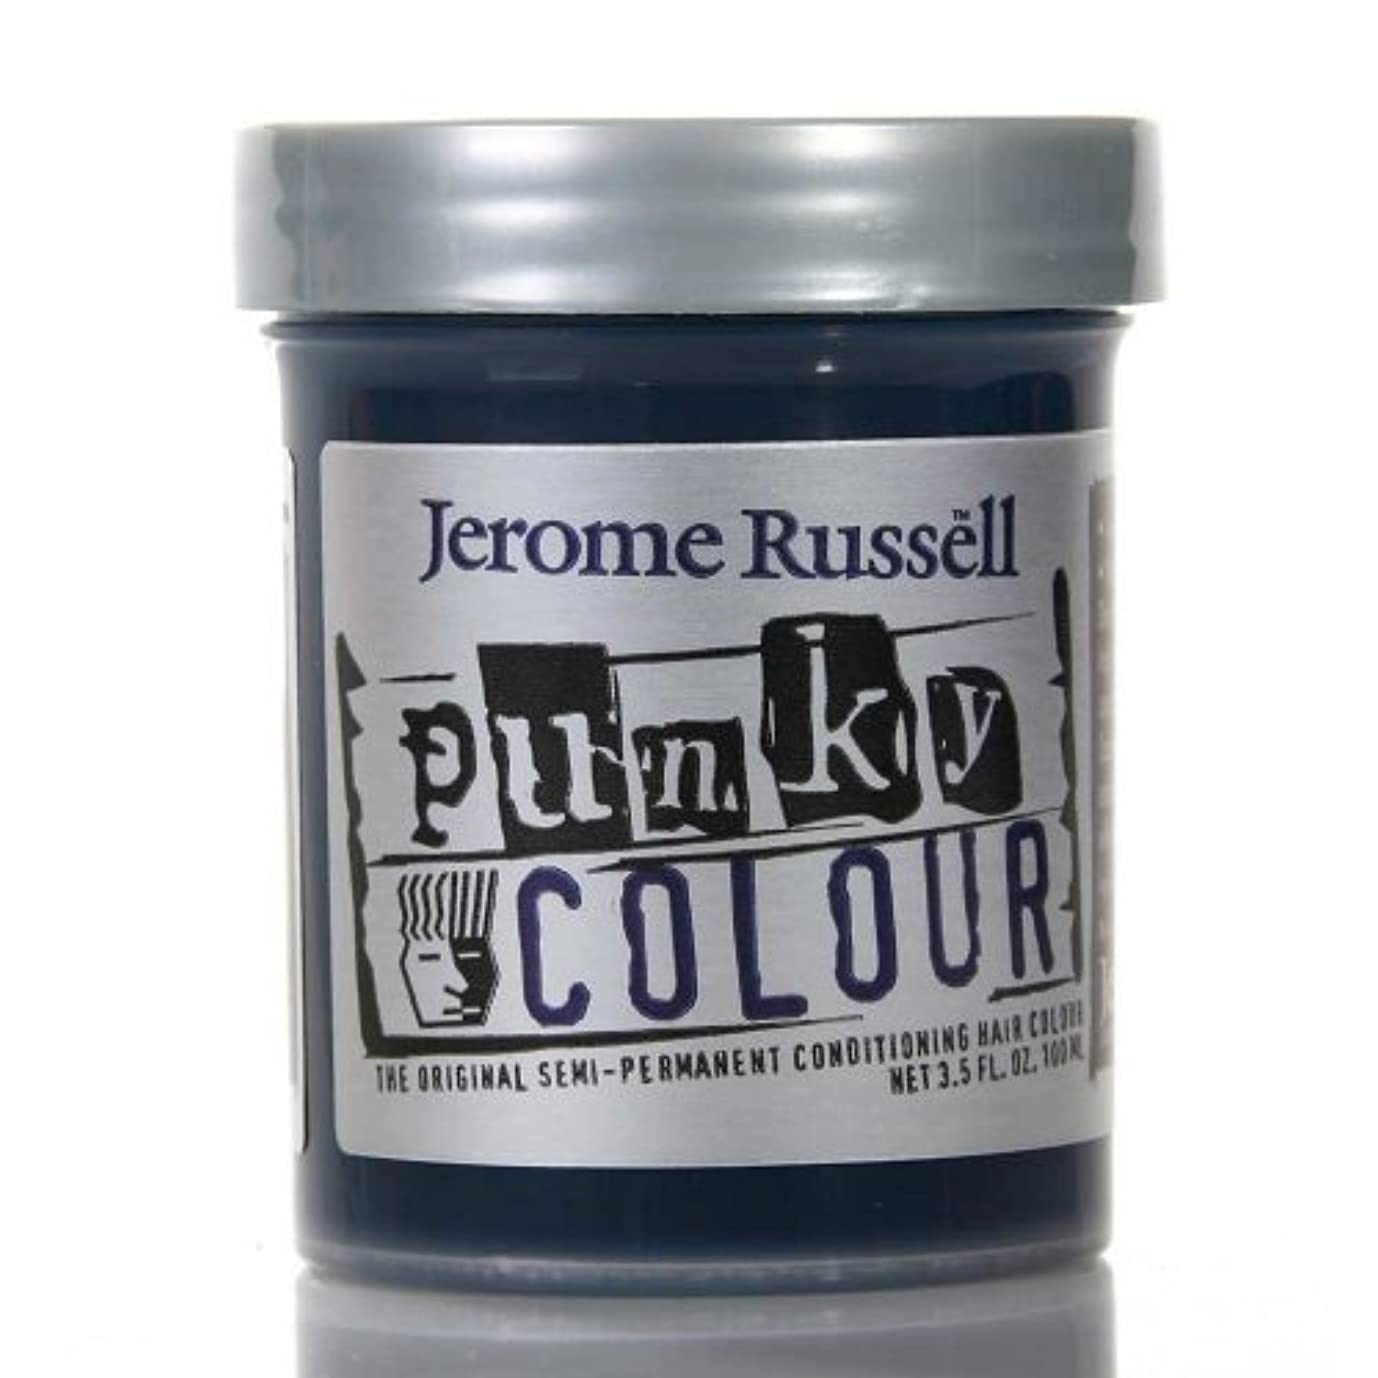 無限大悲観的抑圧者JEROME RUSSELL Punky Color Semi-Permanent Conditioning Hair Color - Midnight Blue (並行輸入品)